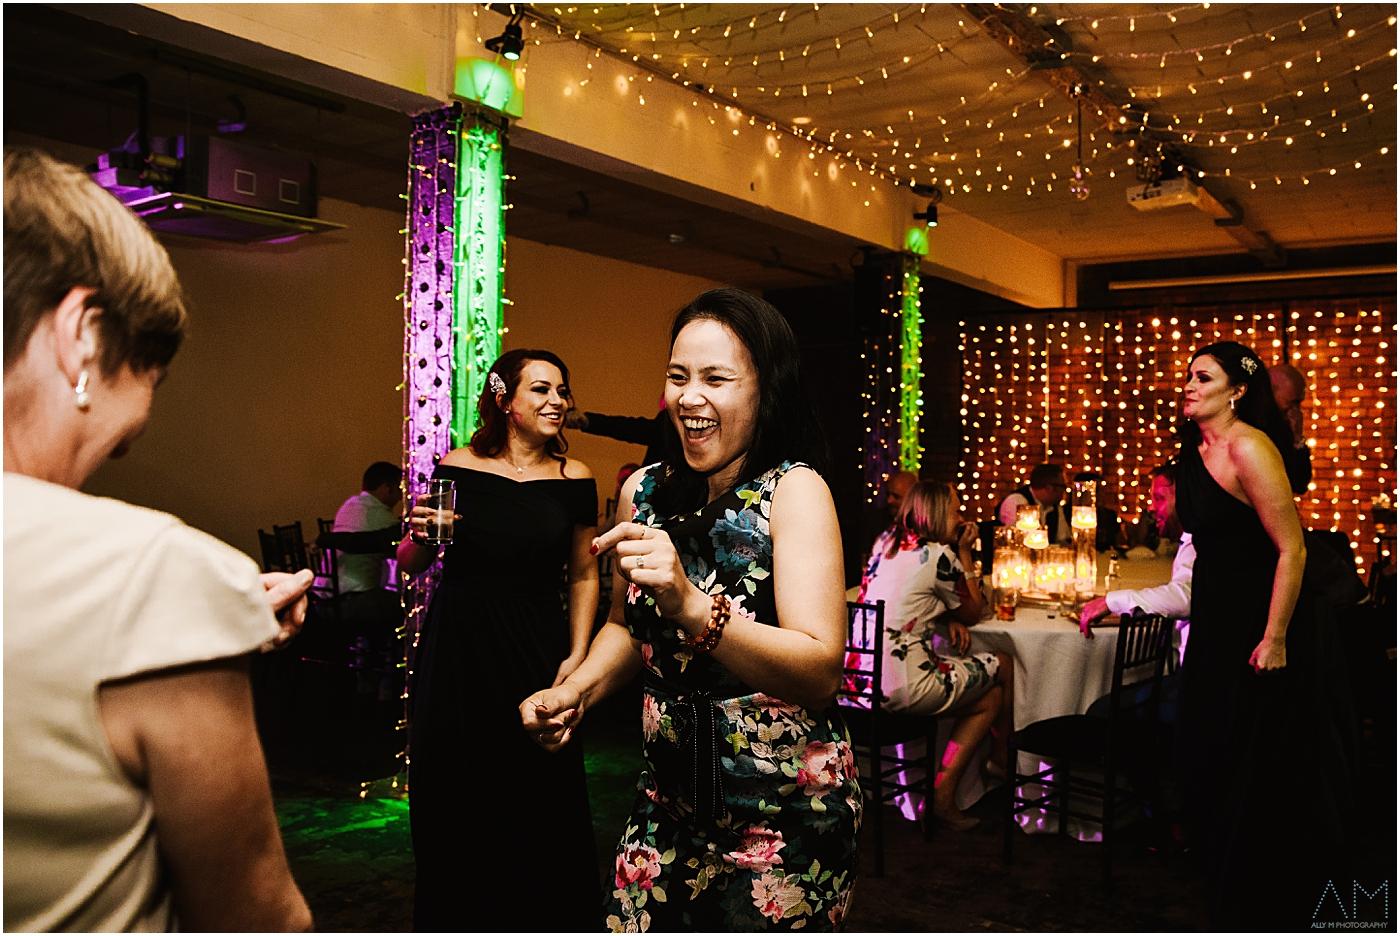 dancing on the dancefllor